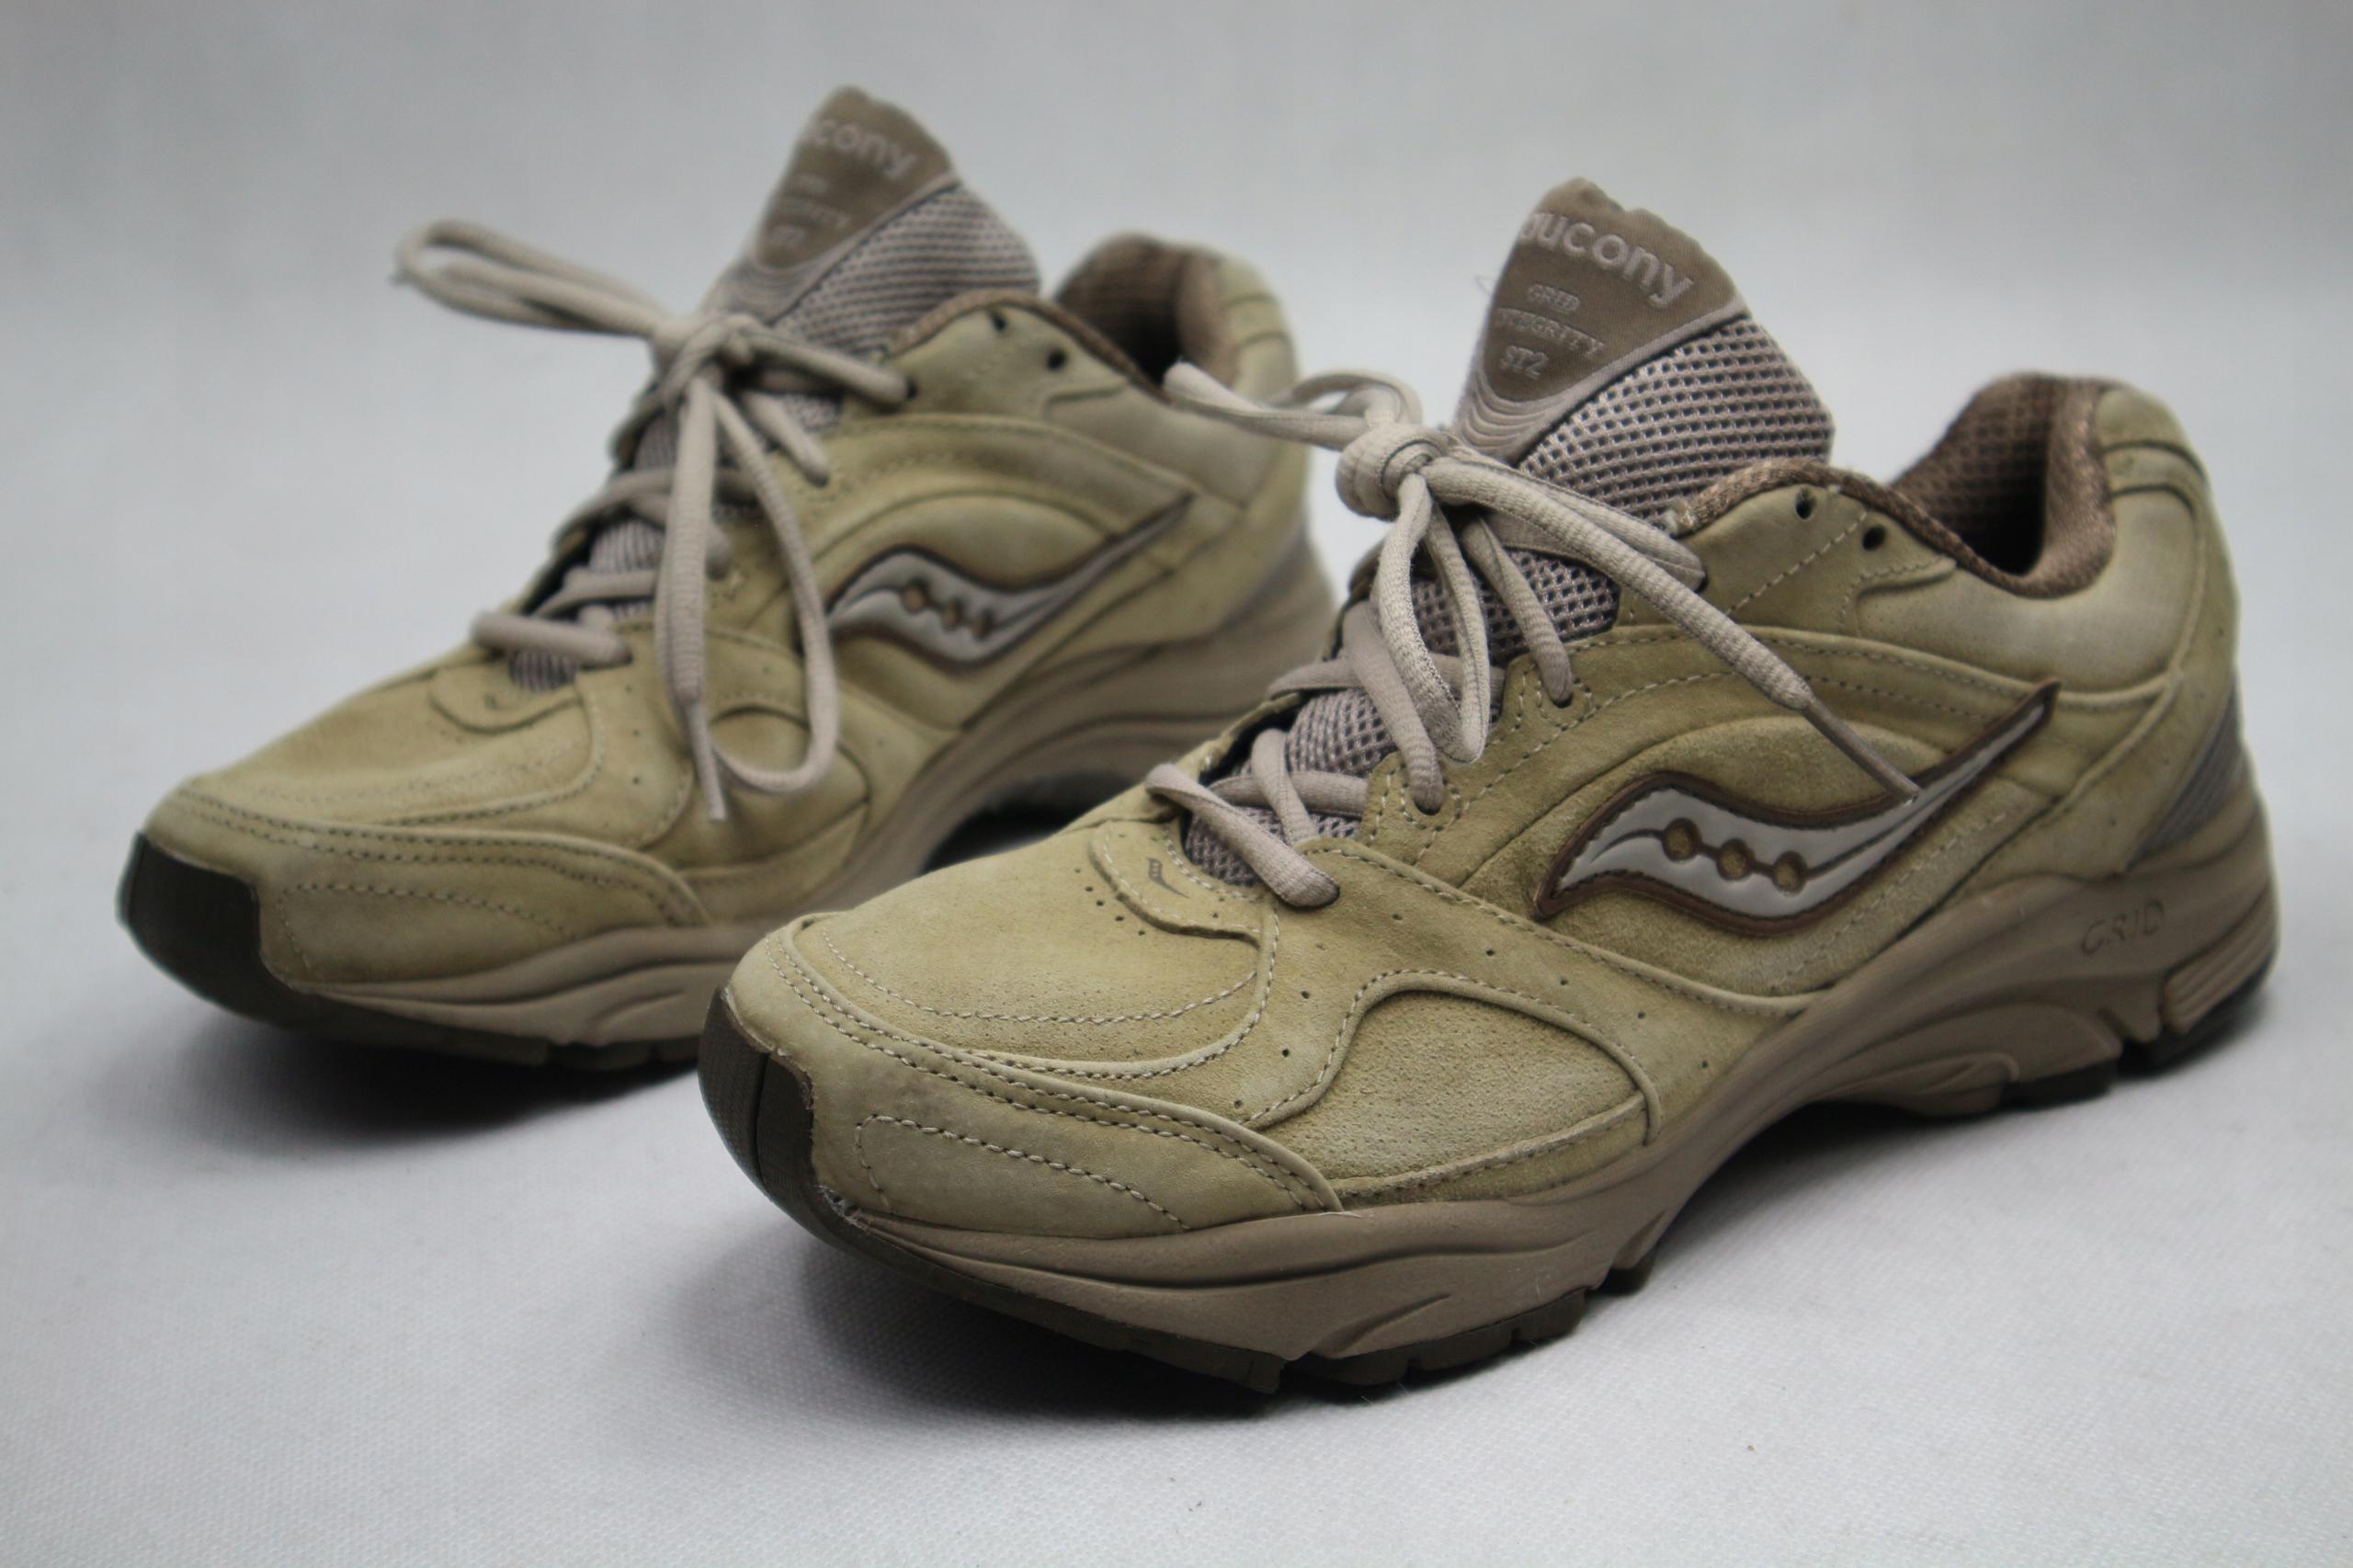 Saucony Grid Integrity ST2 buty biegowe 41 26,5c,